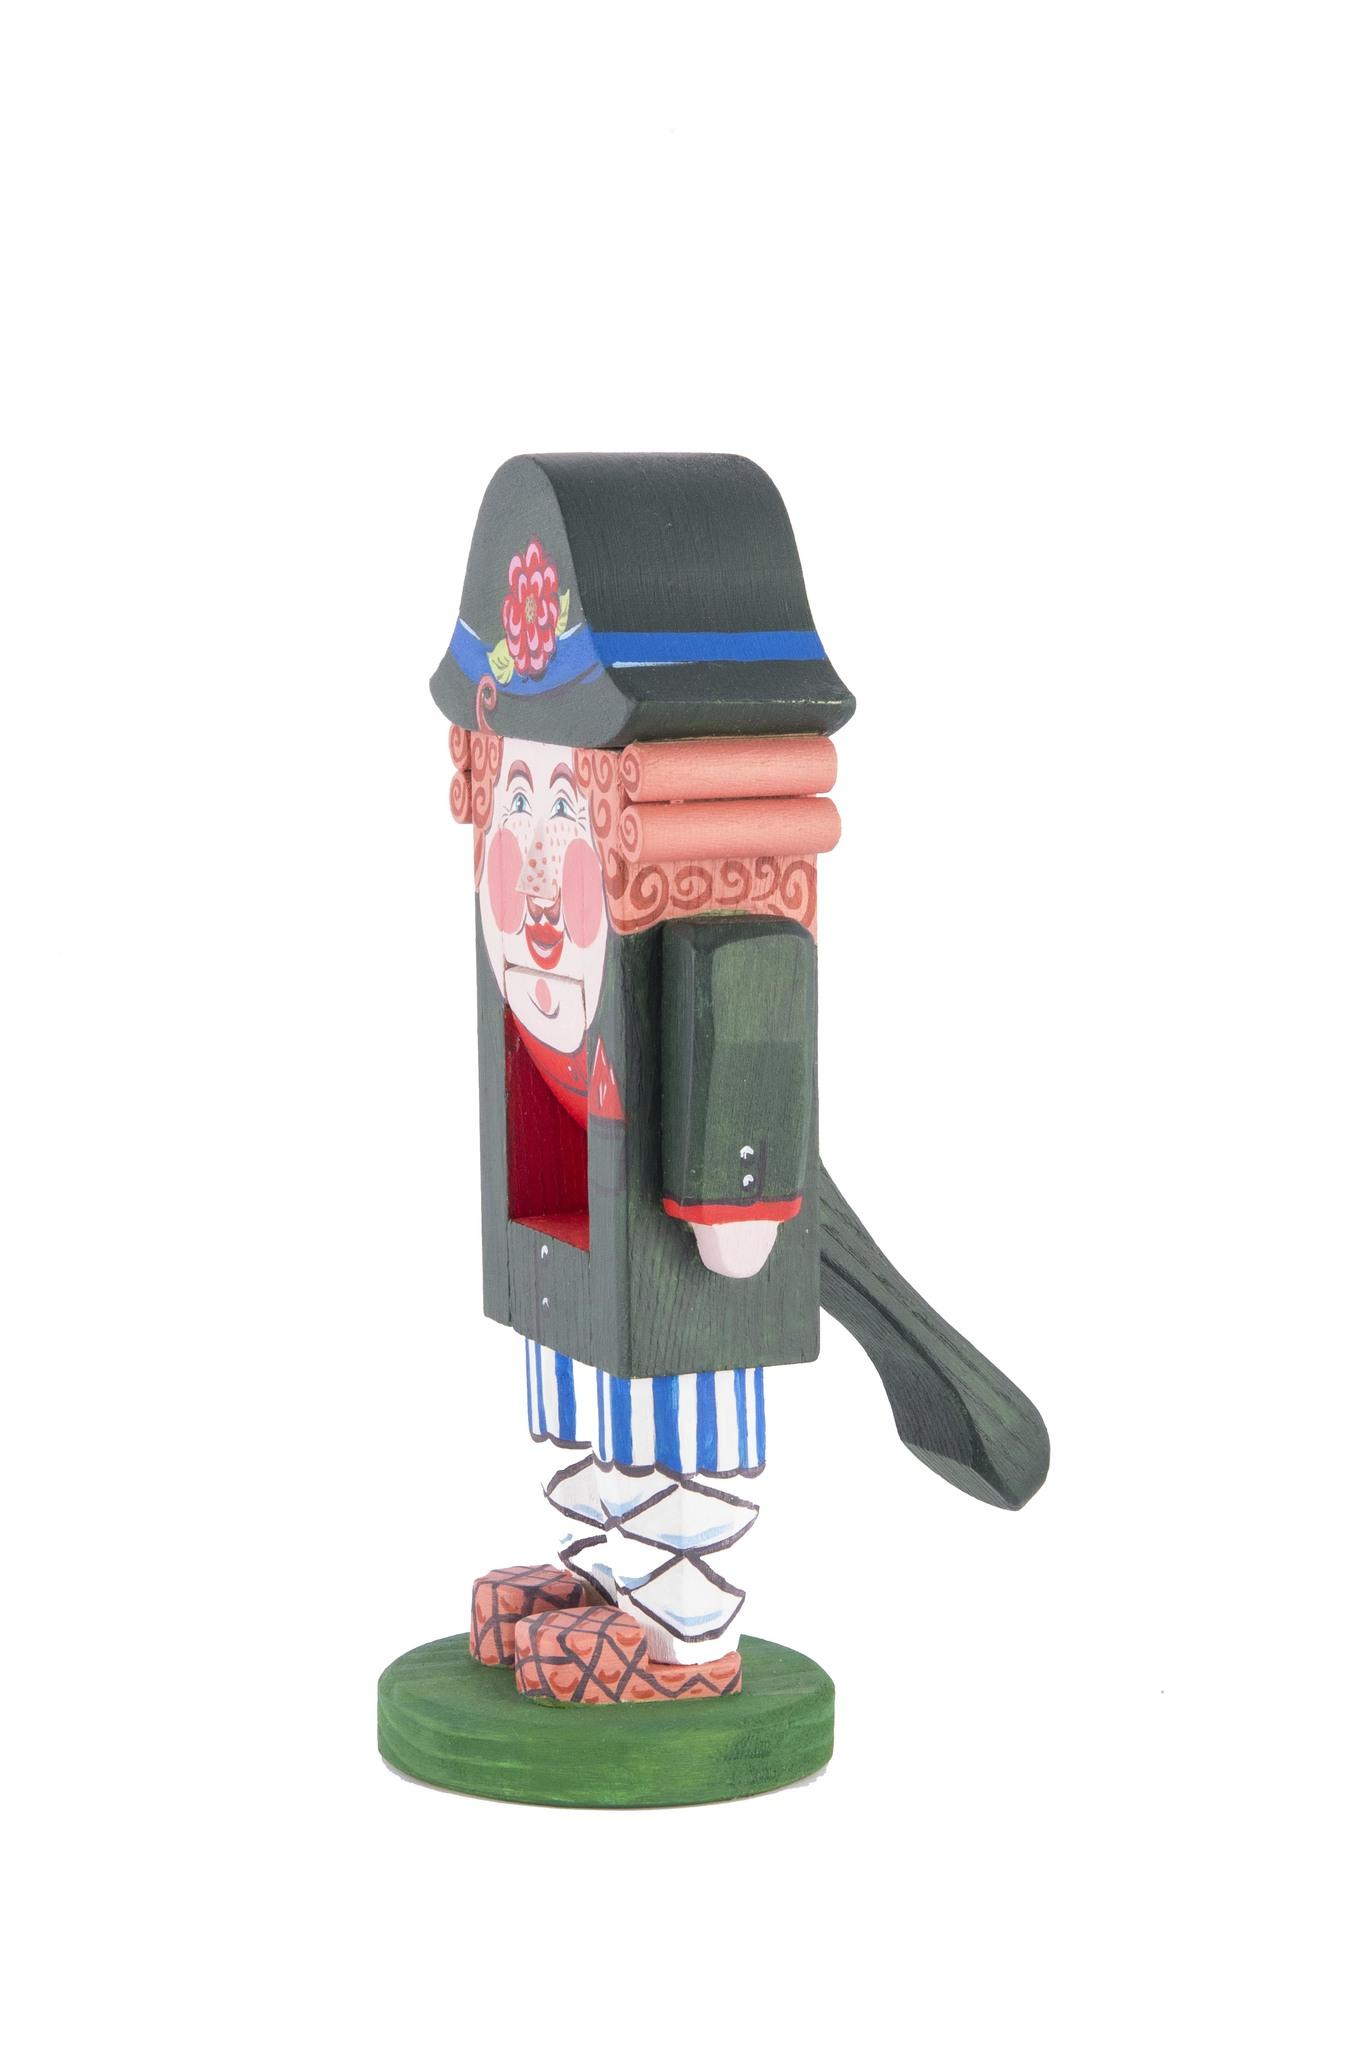 Деревянный щелкунчик орехоколка   «Мужик»